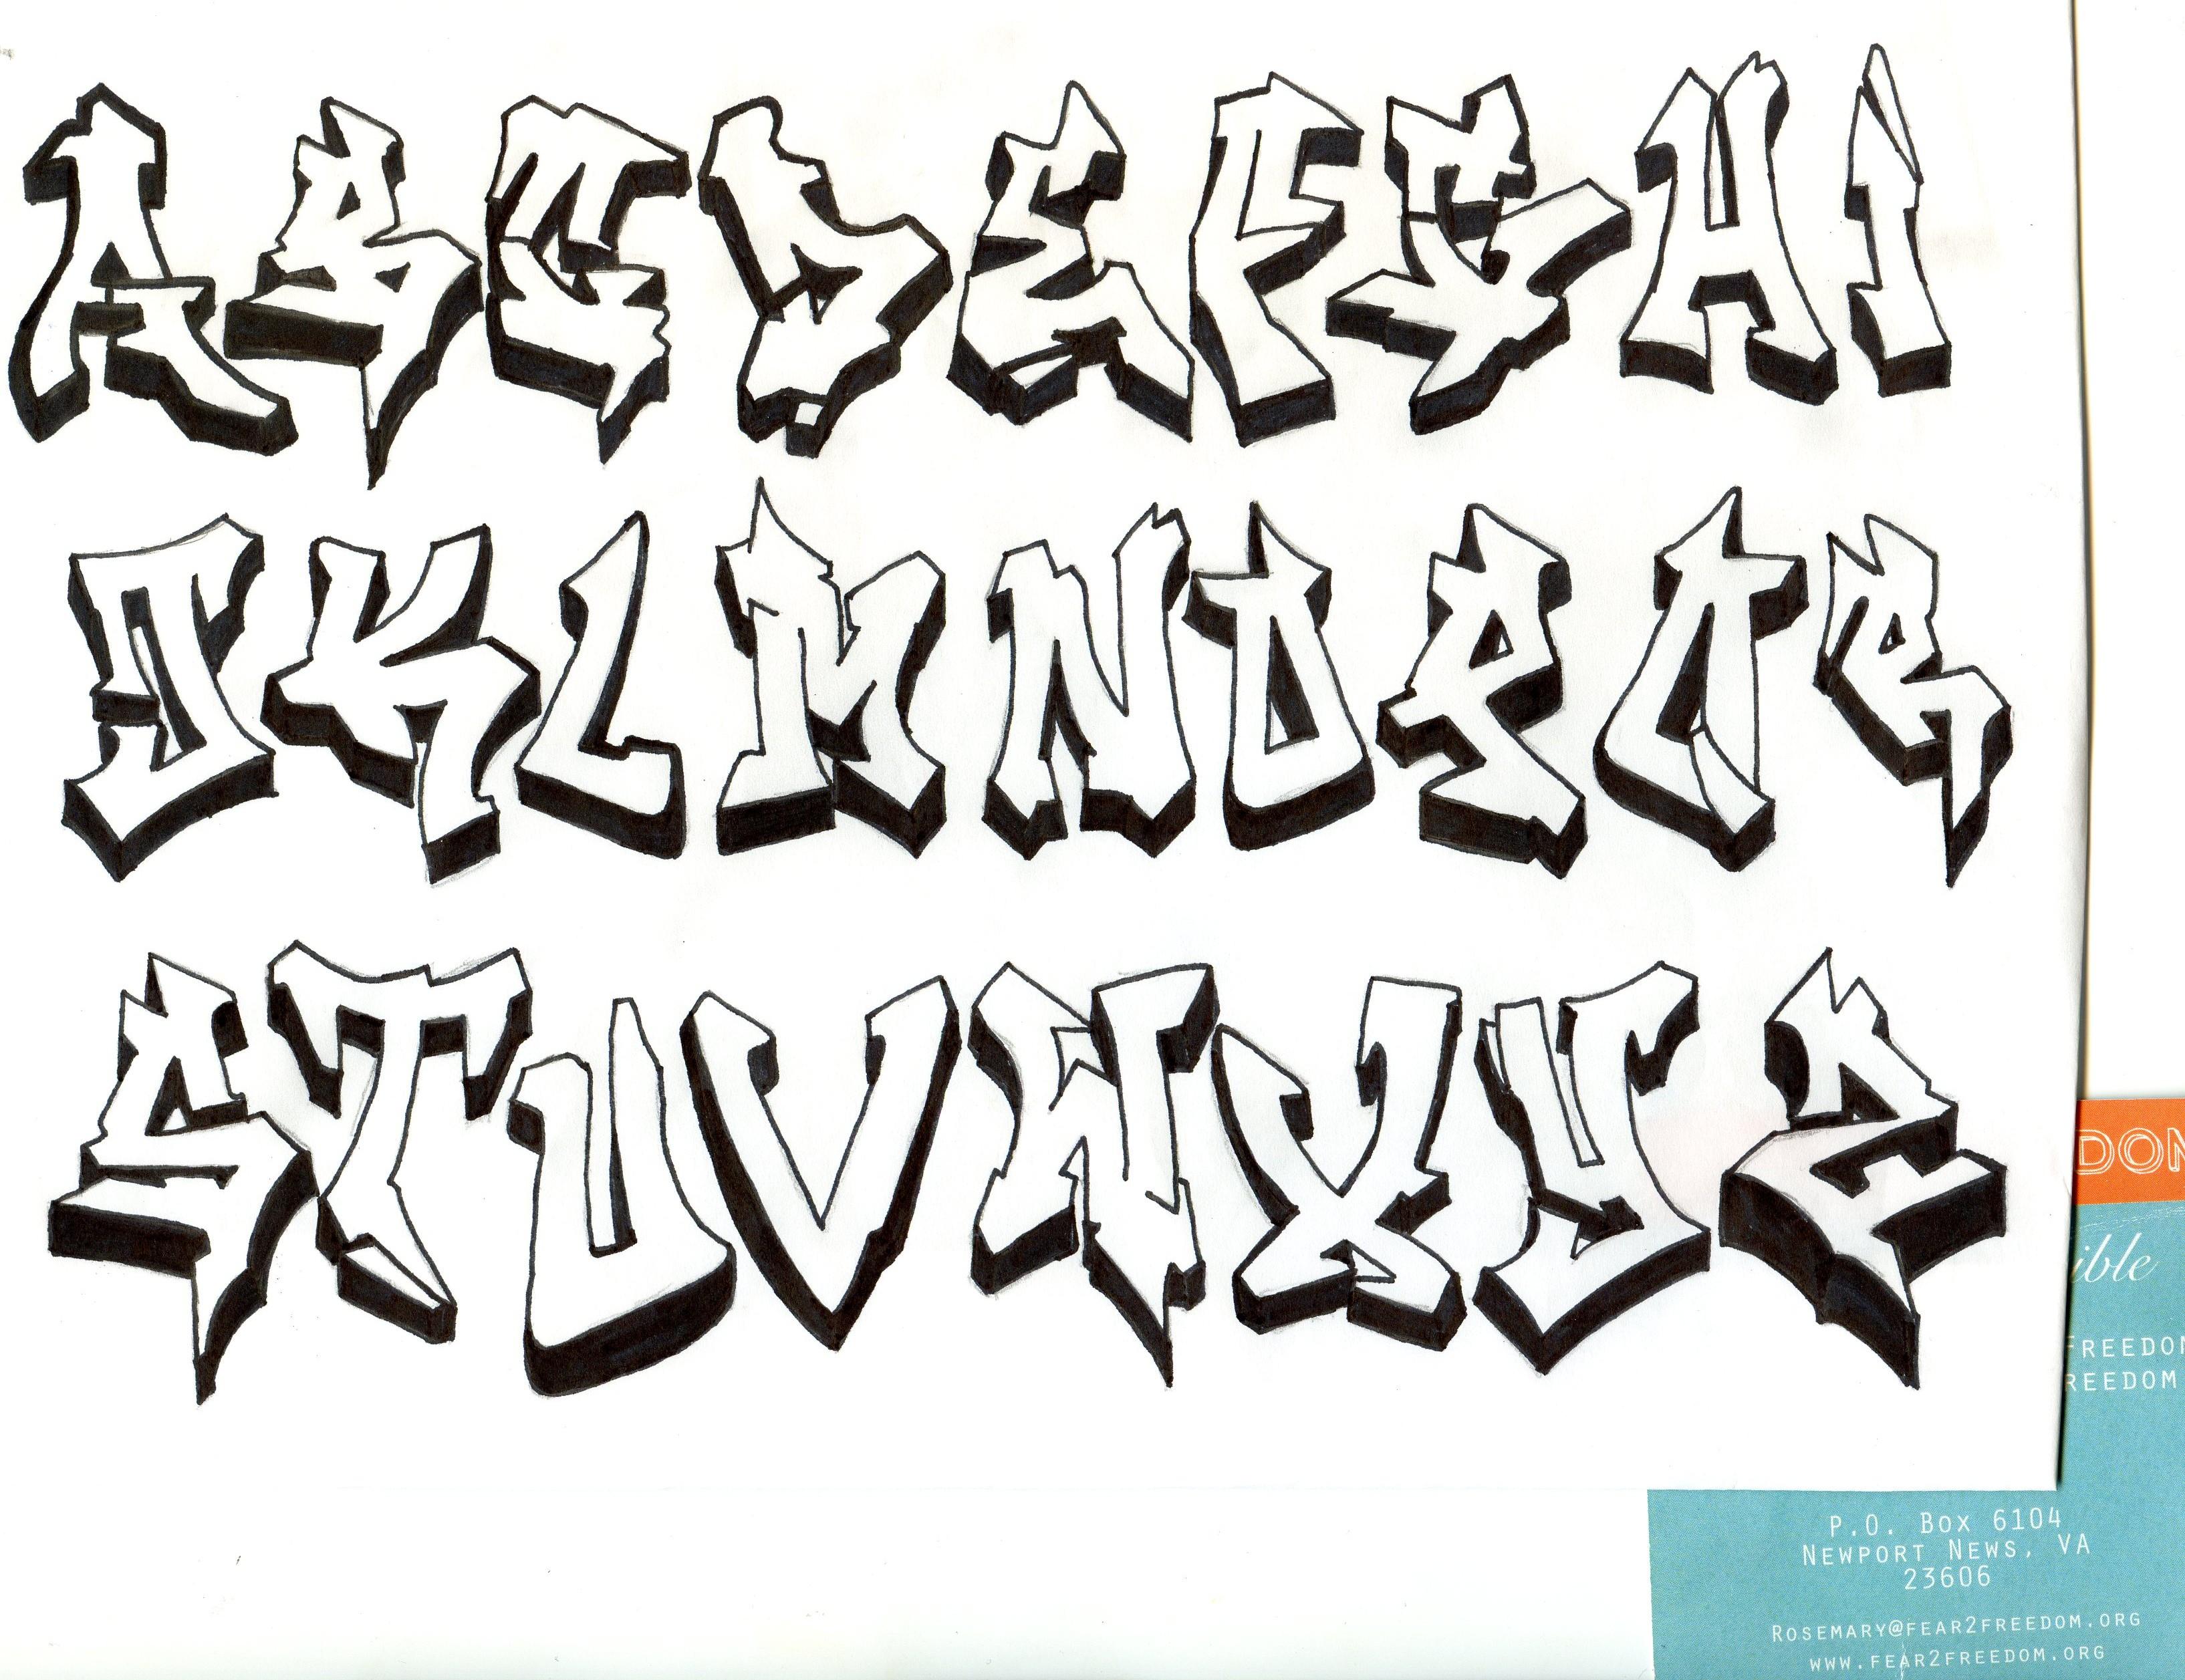 3269x2514 Graffiti Alphabet Fonts Abc Graffiti Fonts Drawings Graffiti Fonts